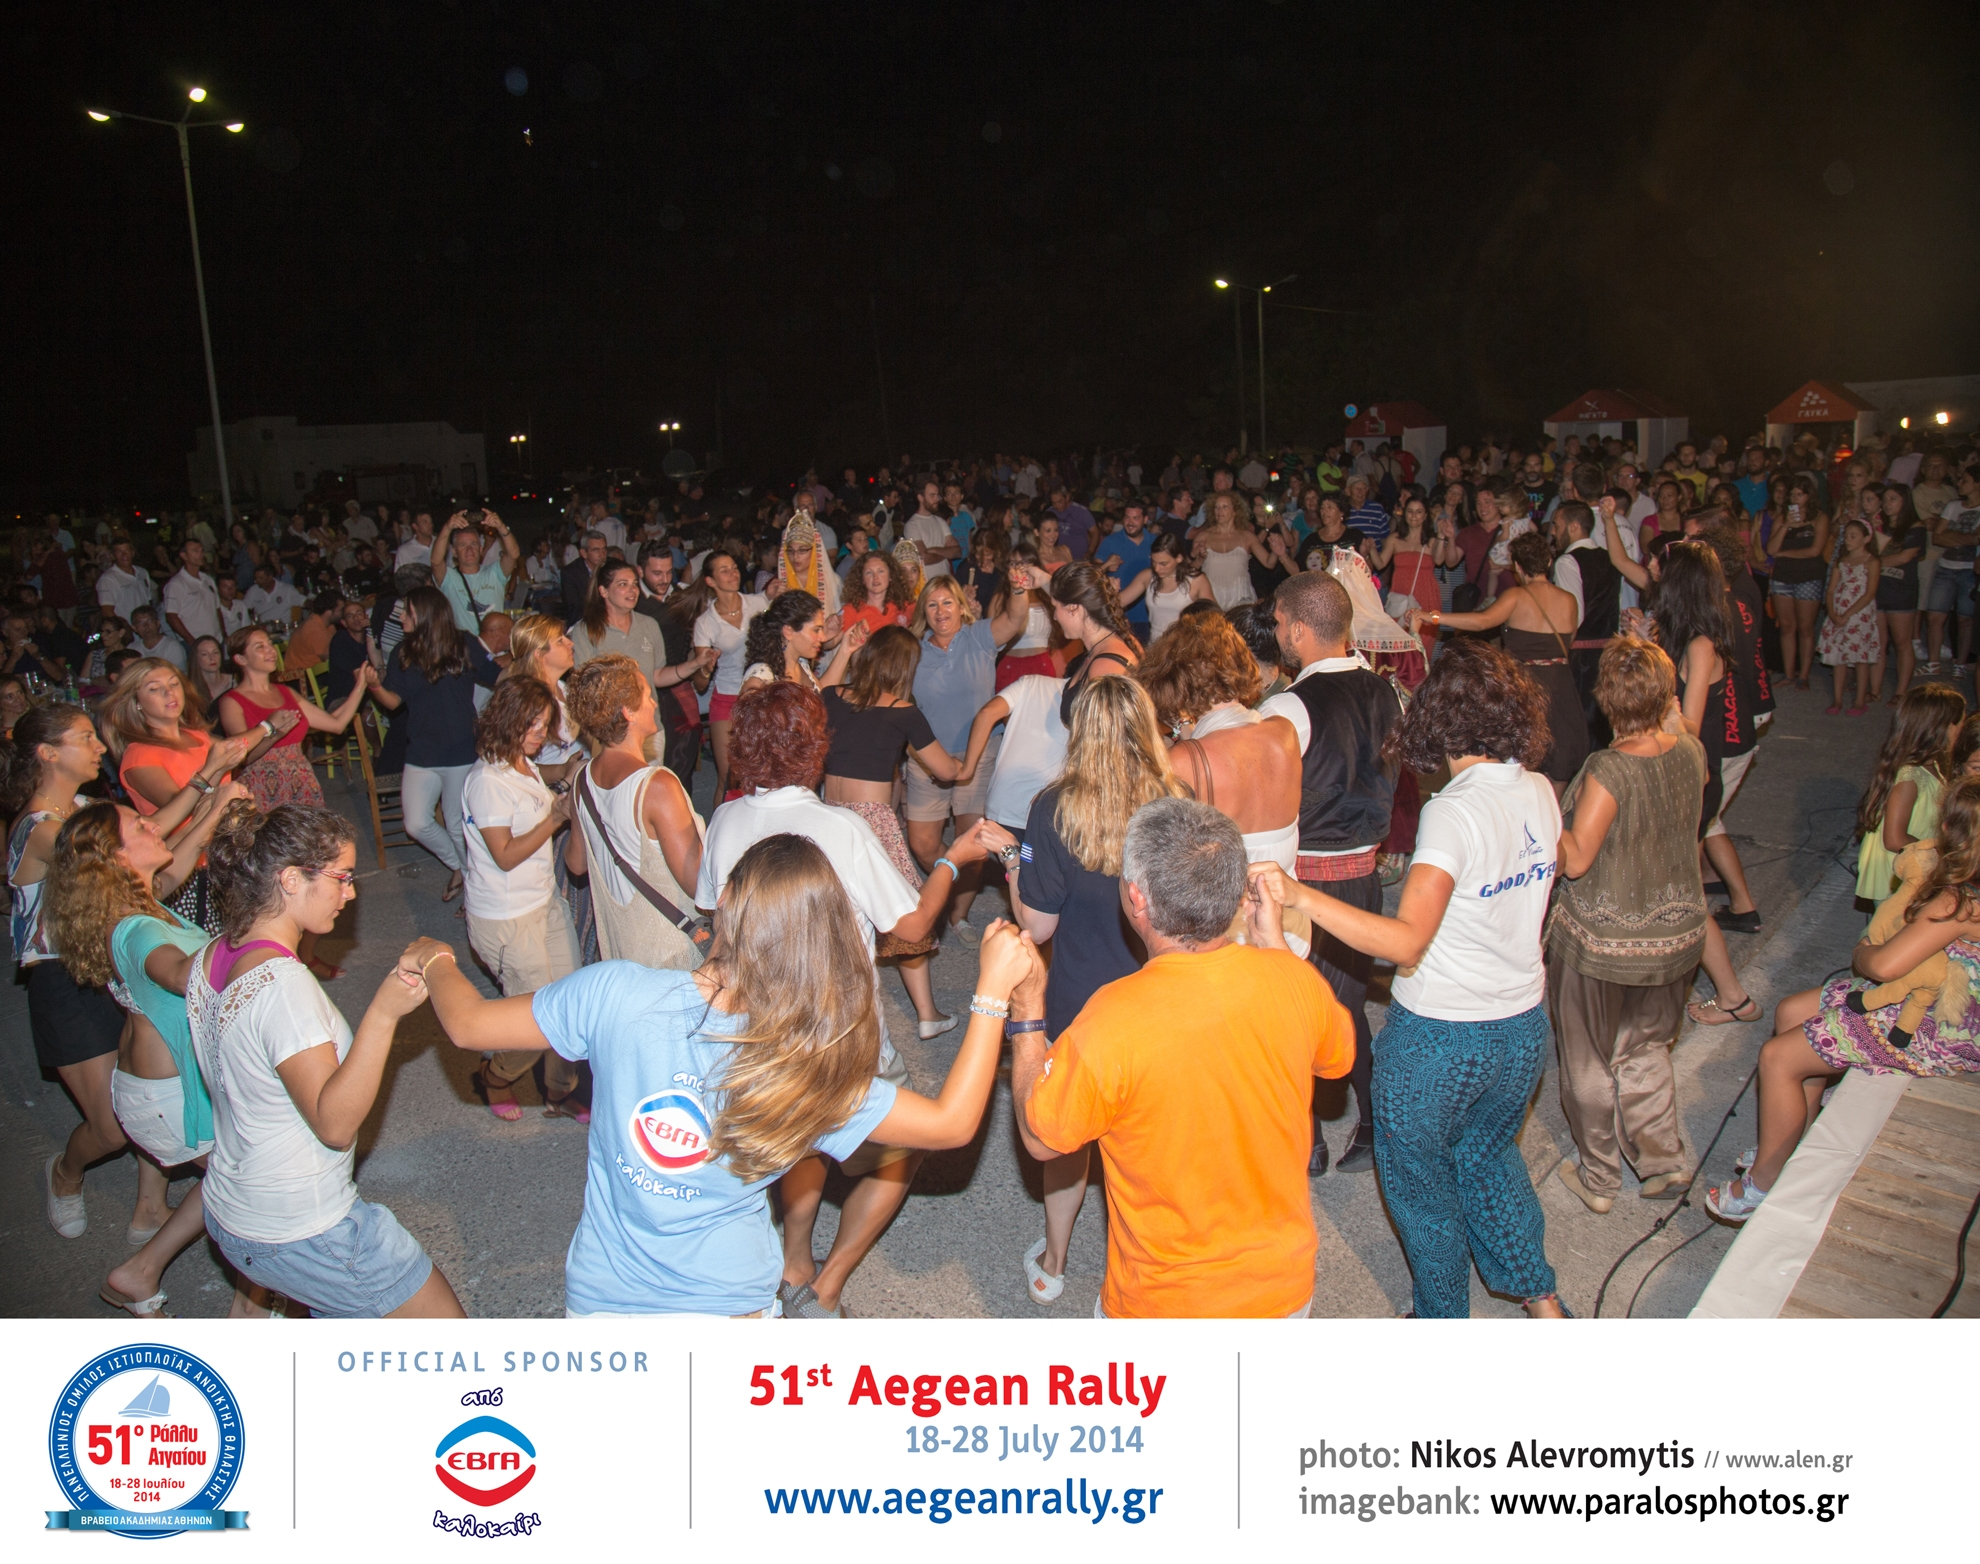 AR 8 Copyright Nikos Alevromytis, 51st Aegean Rally, HORC